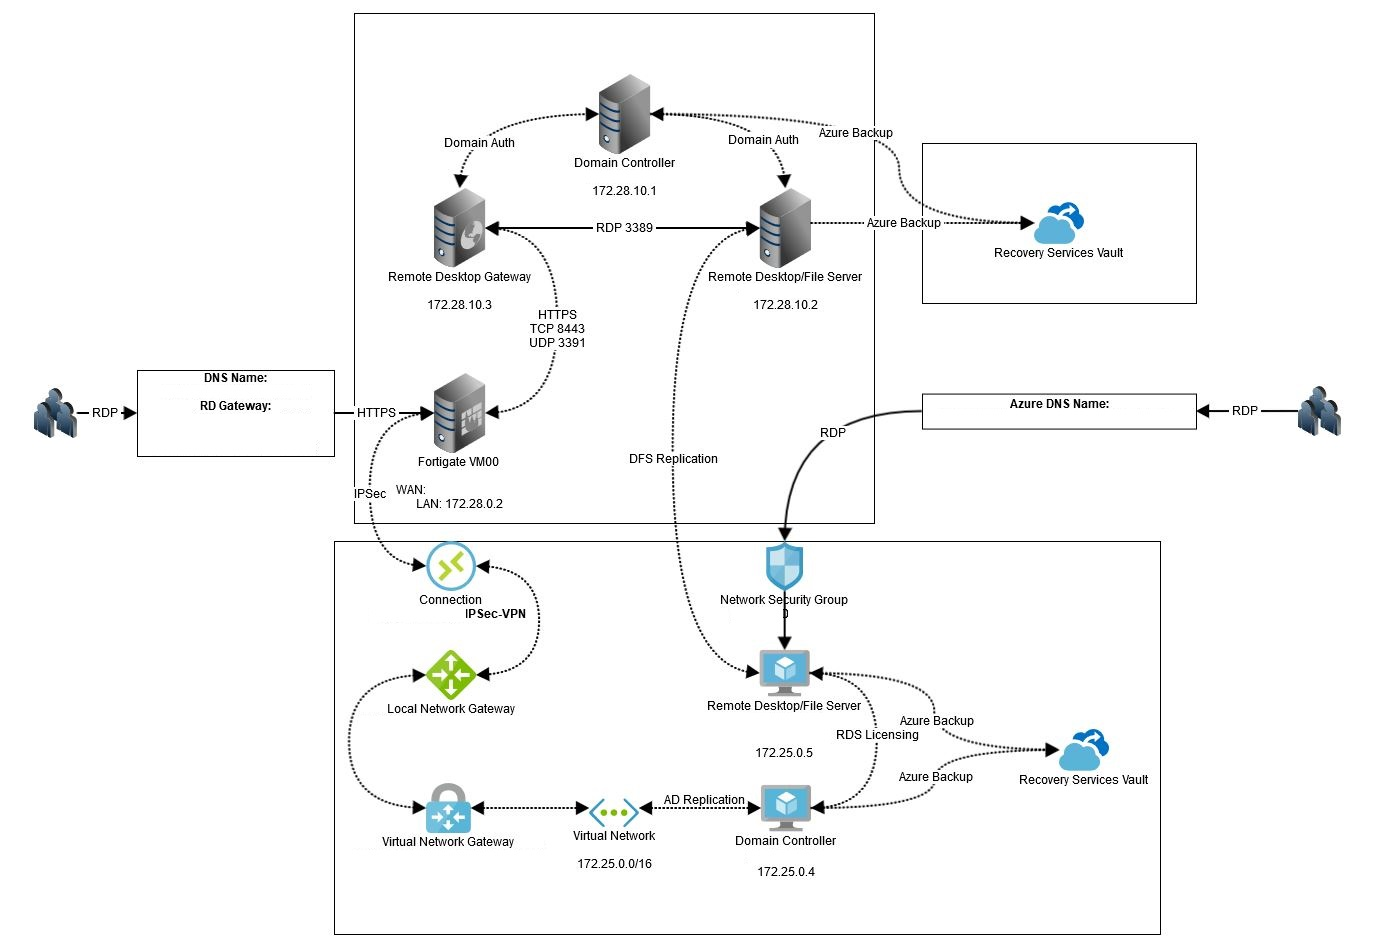 site to vpn diagram johnson outboard dealers brisbane replication replicate on premises hyper v vm